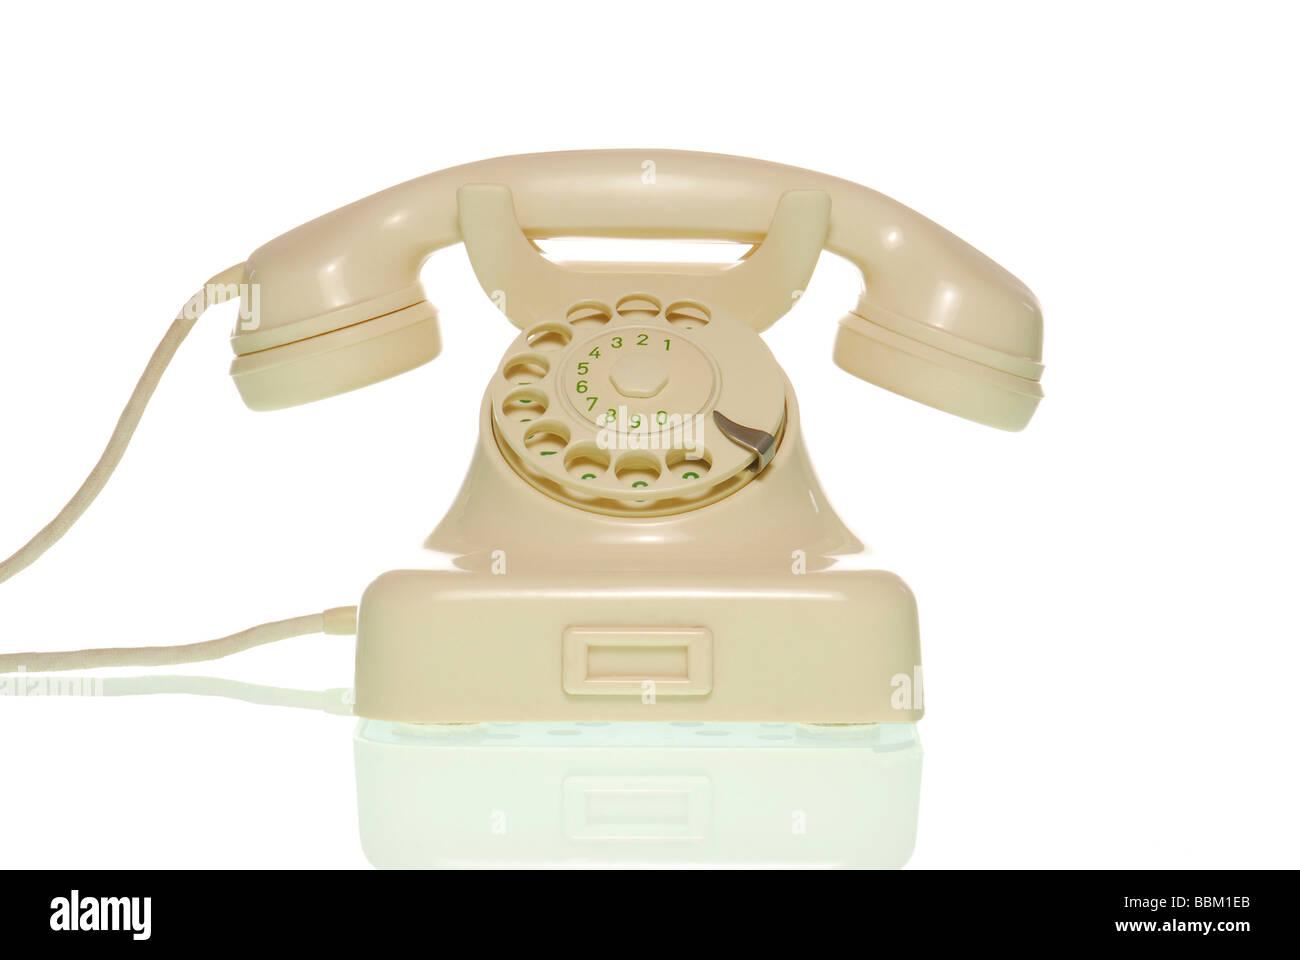 Old-fashioned telephone - Stock Image